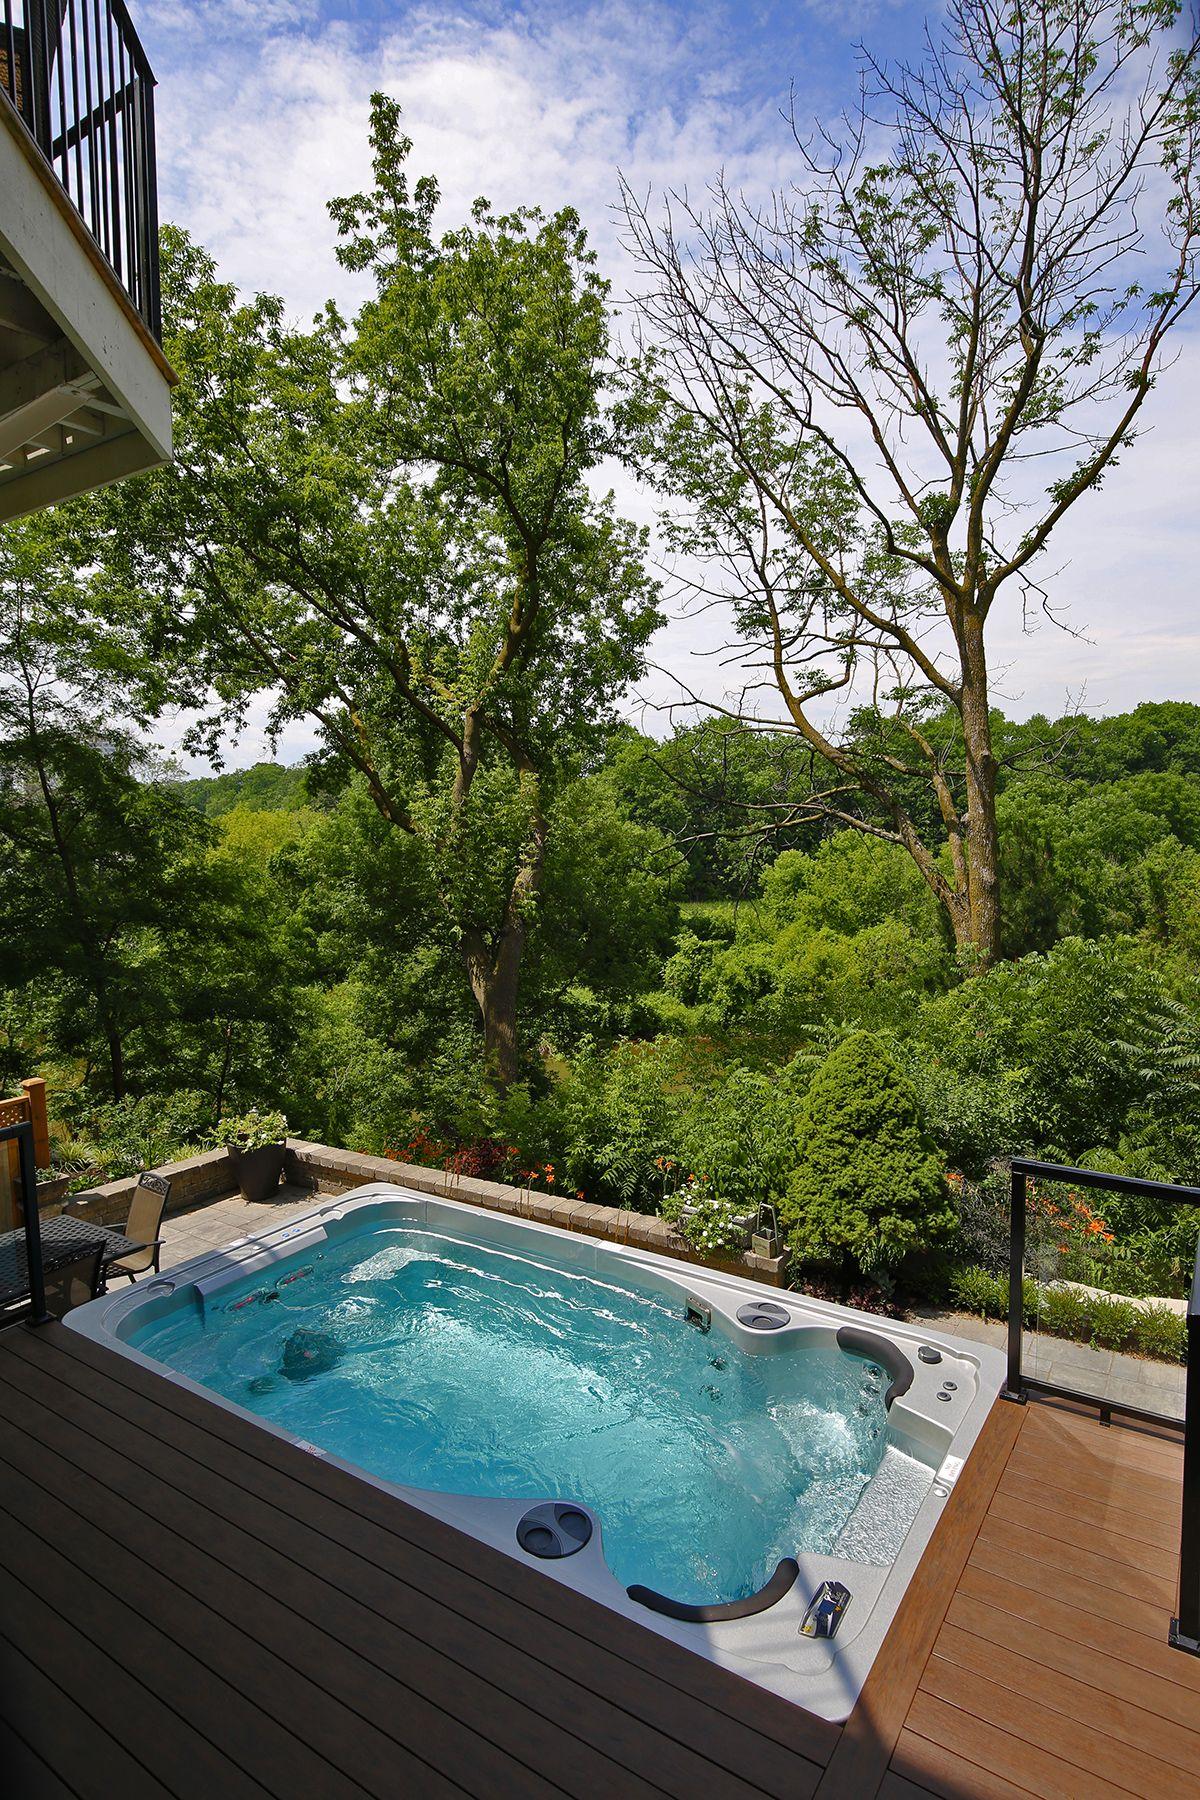 Swim Spas Hot Tub Backyard Hot Tub Garden Modern Hot Tubs